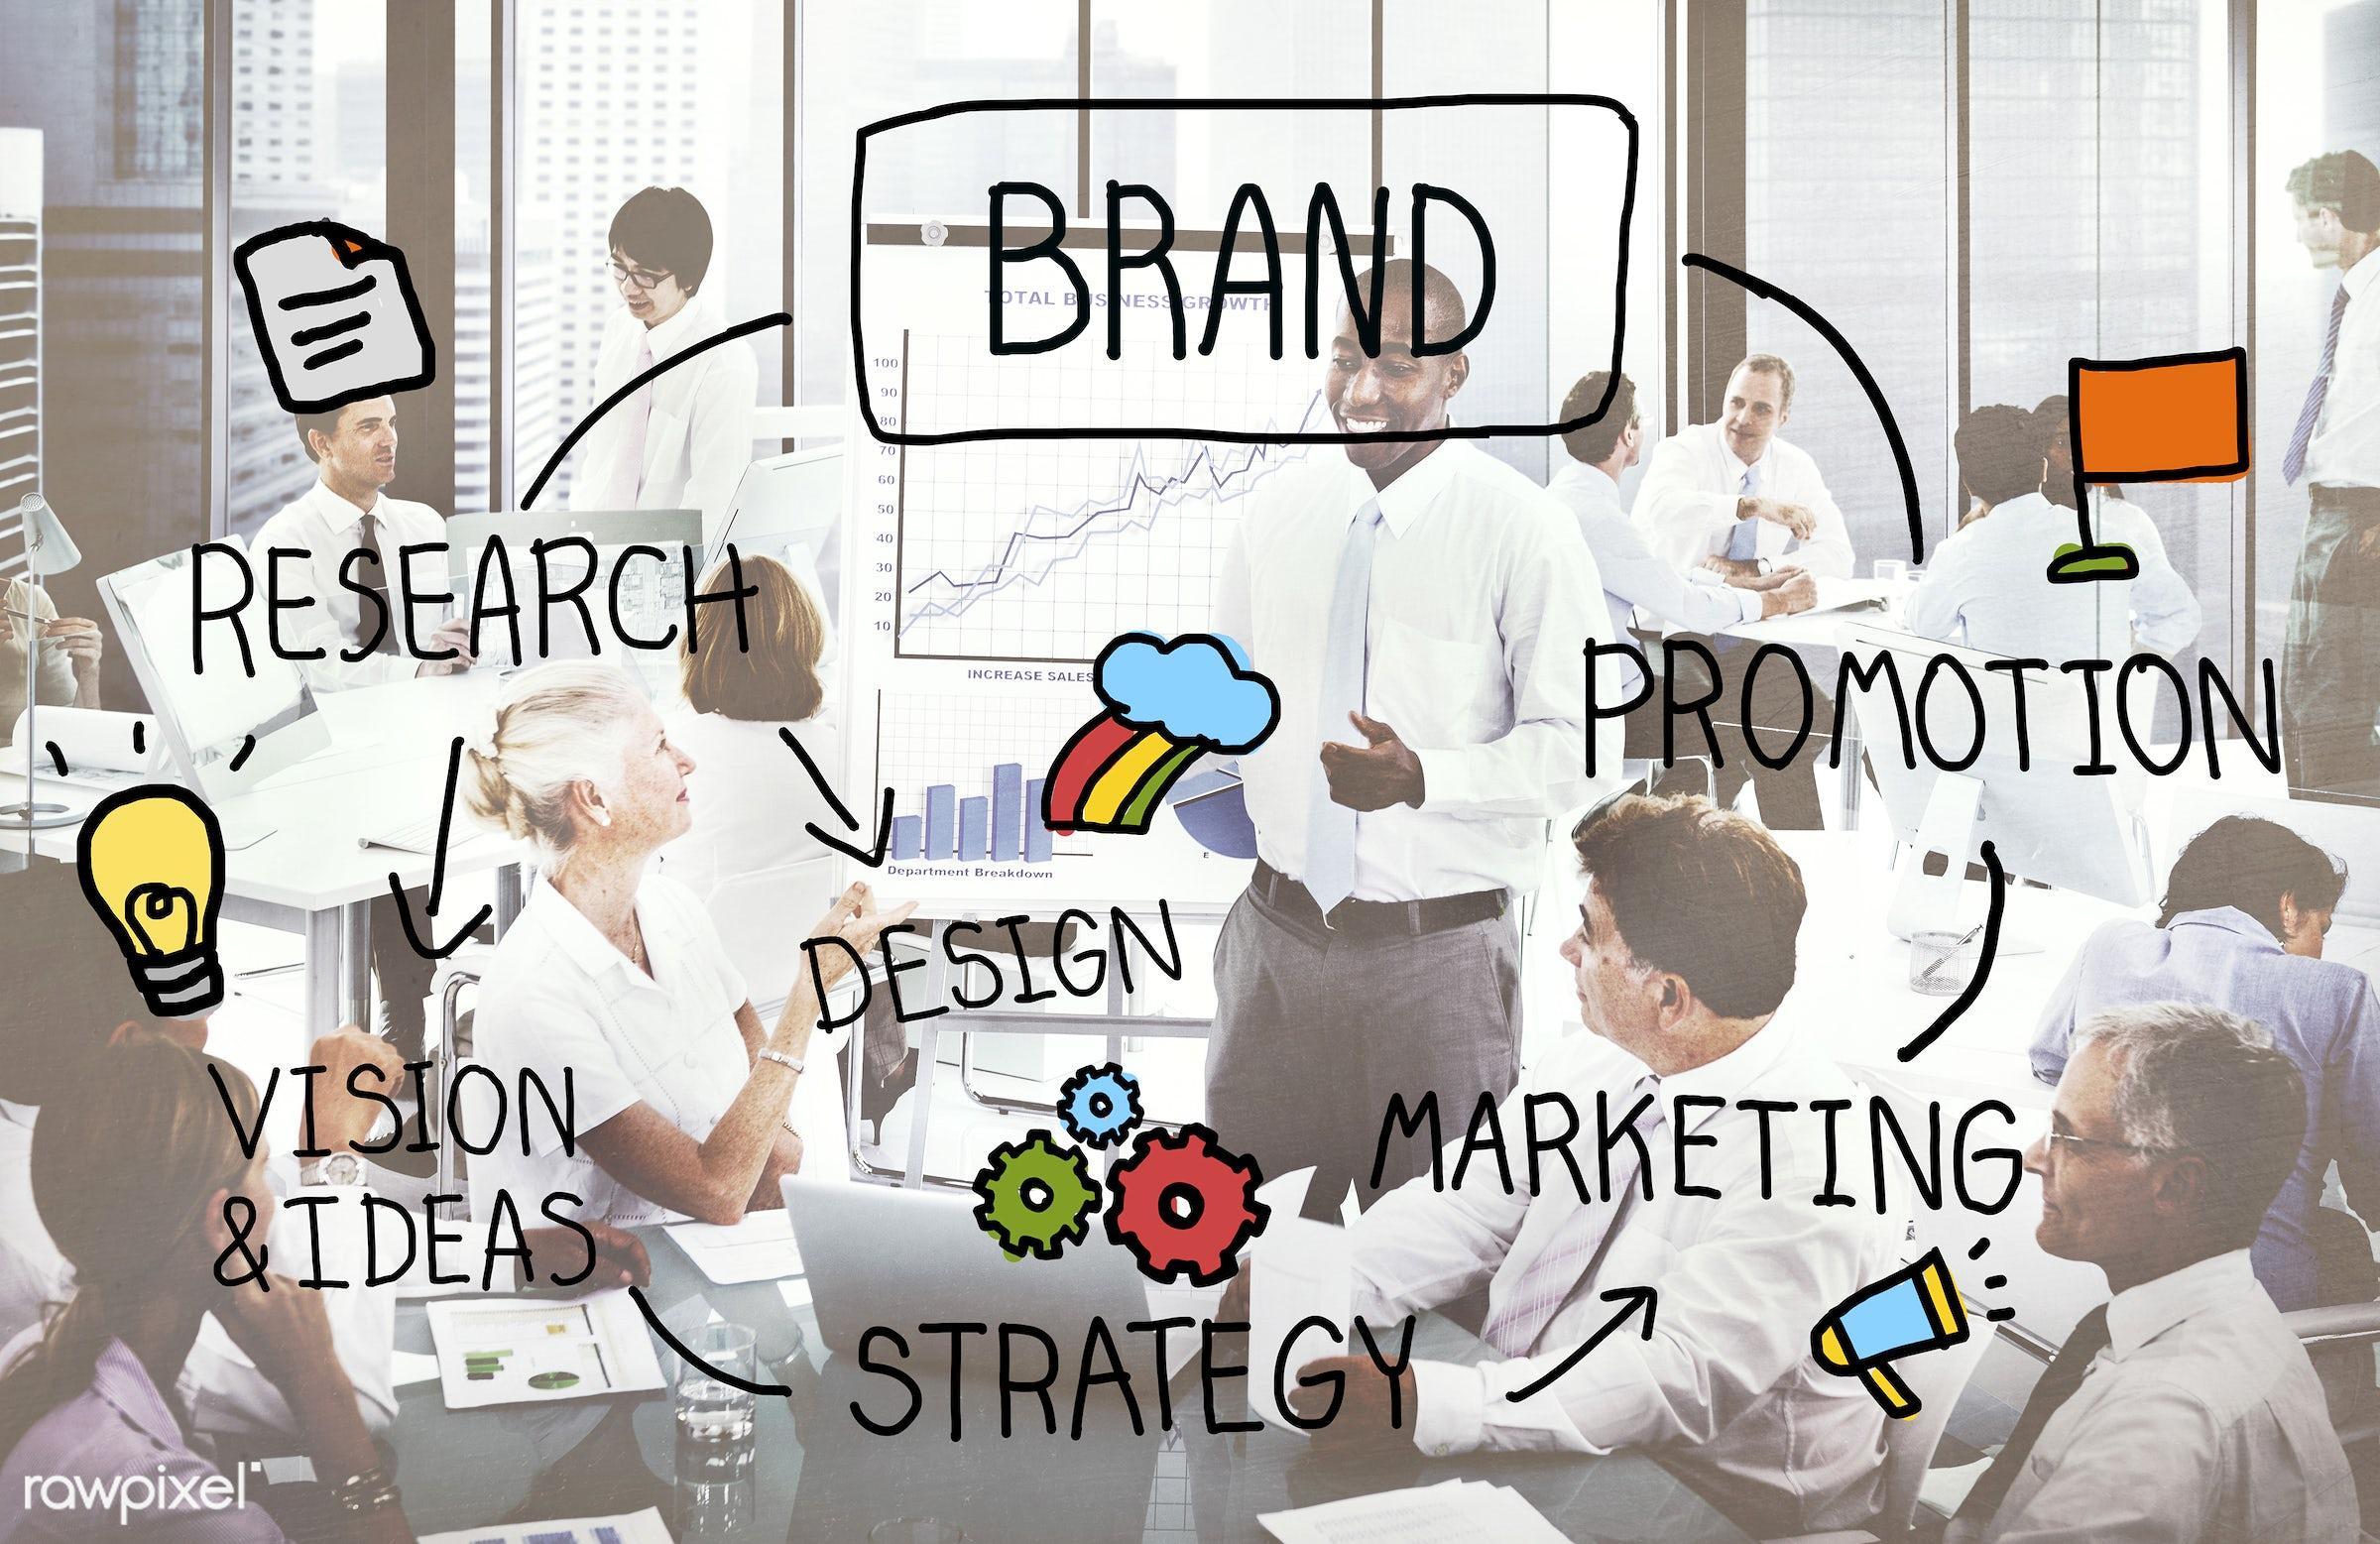 advertising, african descent, asian ethnicity, brainstorming, brand, brand name, branding, business, businessmen,...